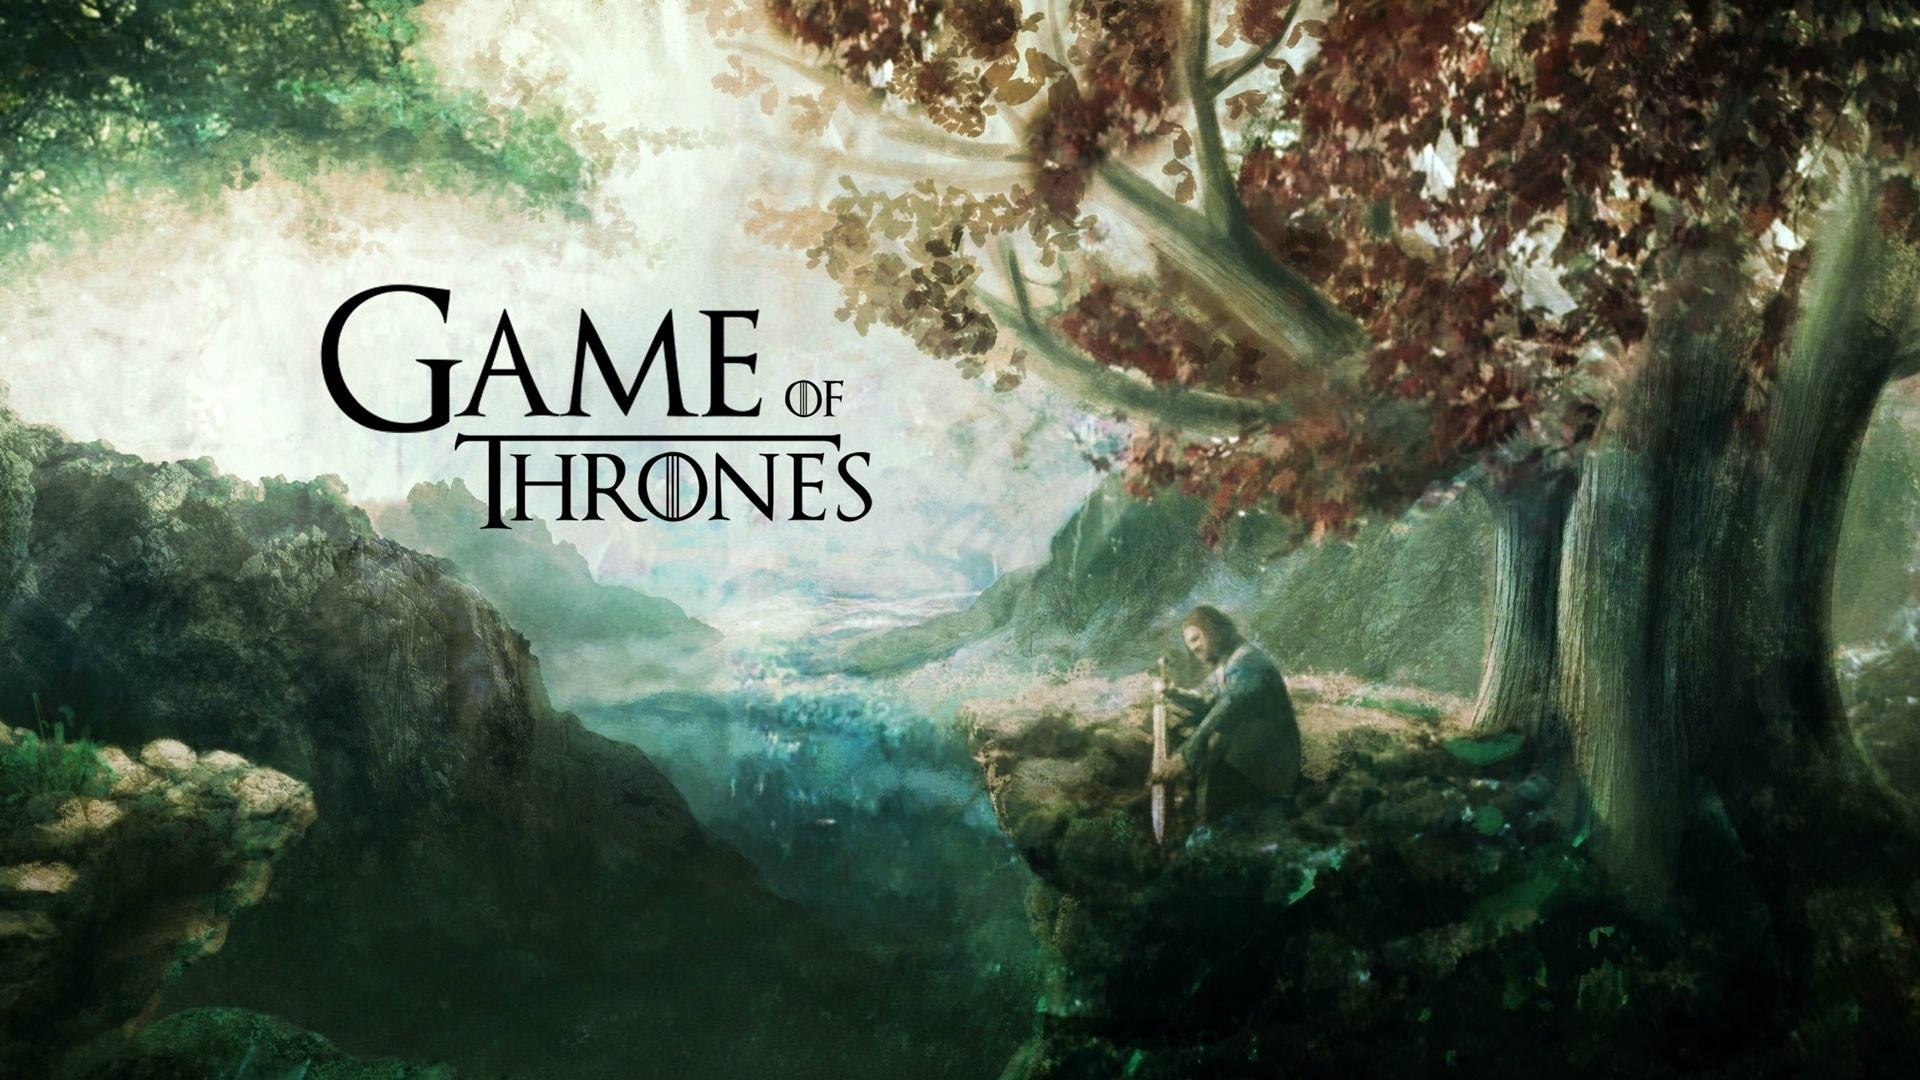 Full-HD-1080p-Game-of-thrones-HD-Desktop-Backgrounds-wallpaper-wp3406014